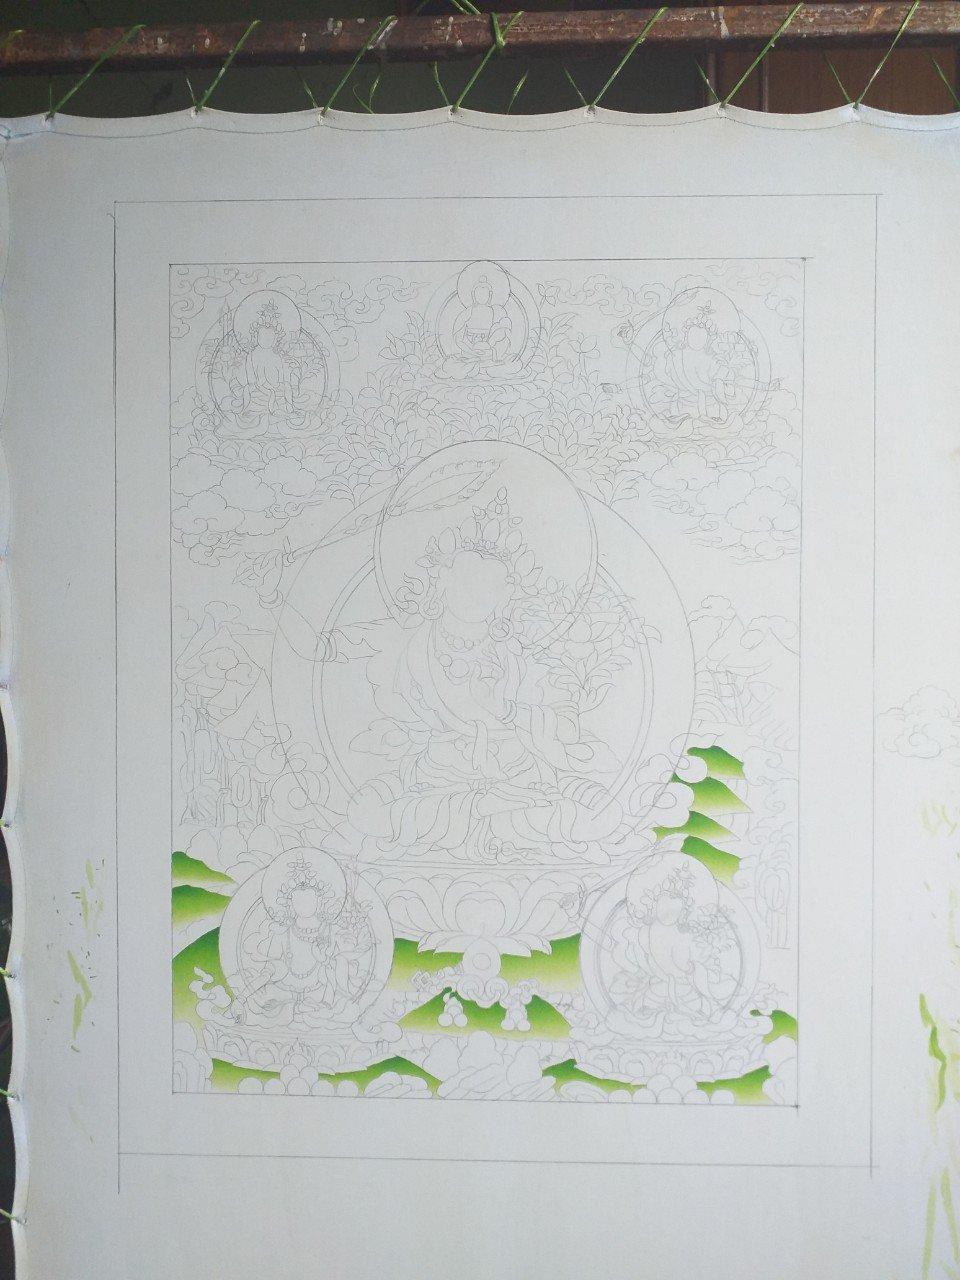 Sketching process of Manjushree Thangka Painting